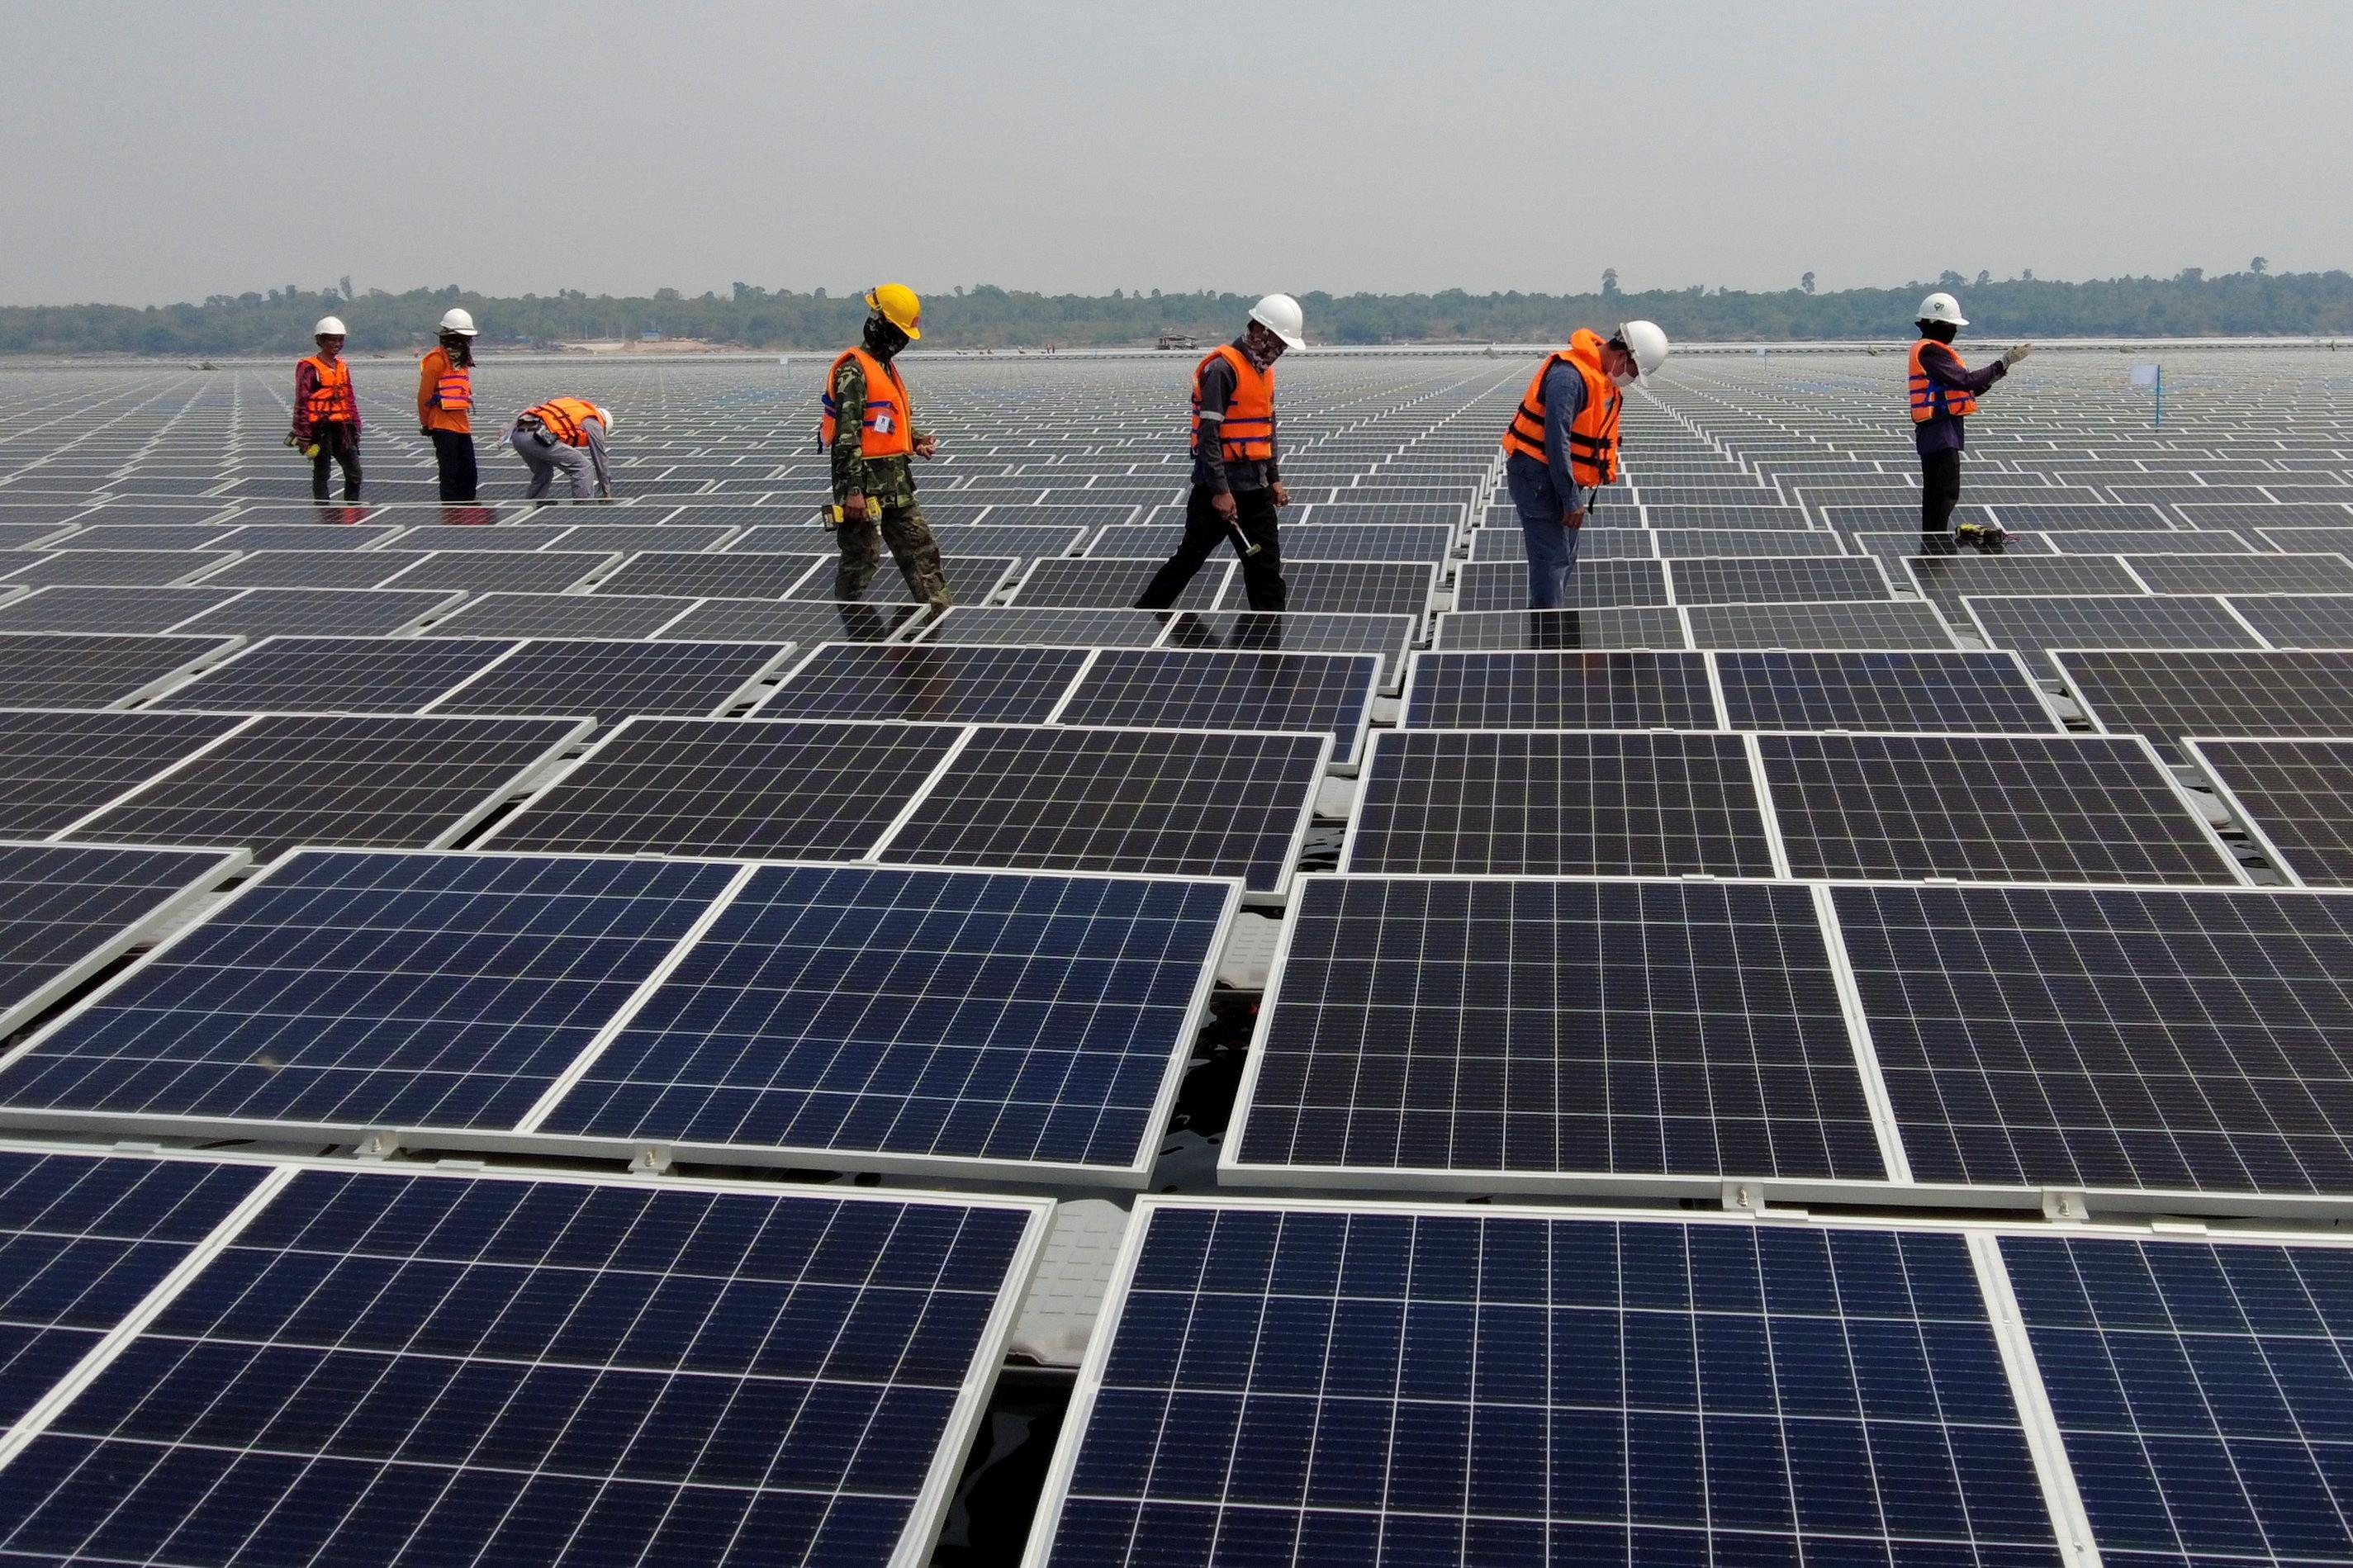 Workers walk between solar cell panels